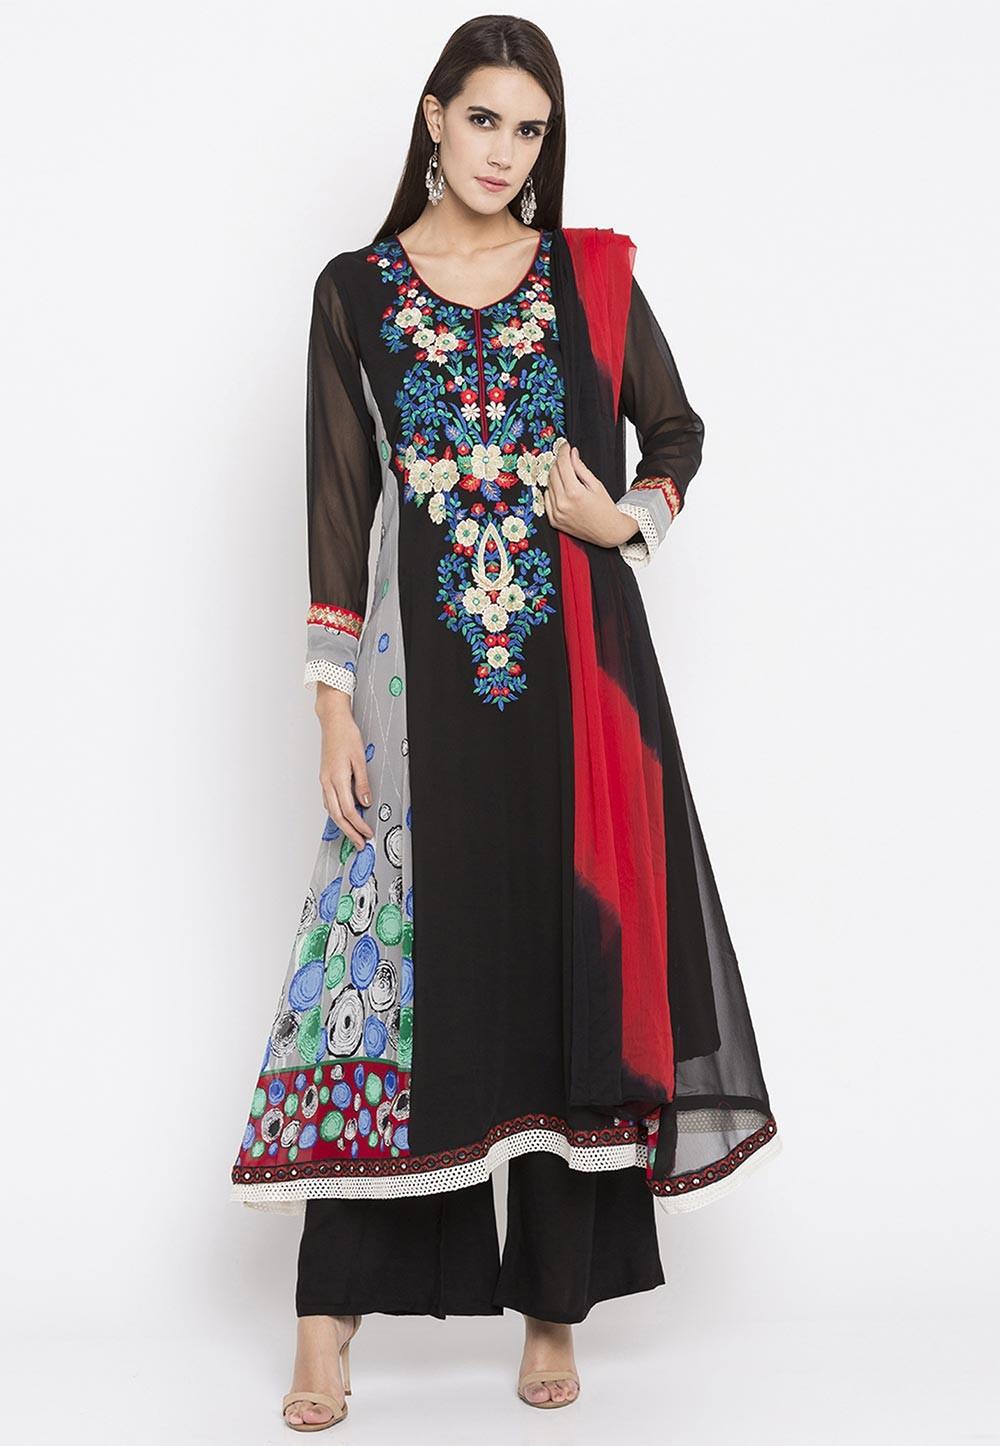 Black Color Faux Georgette Readymade Salwar Kameez